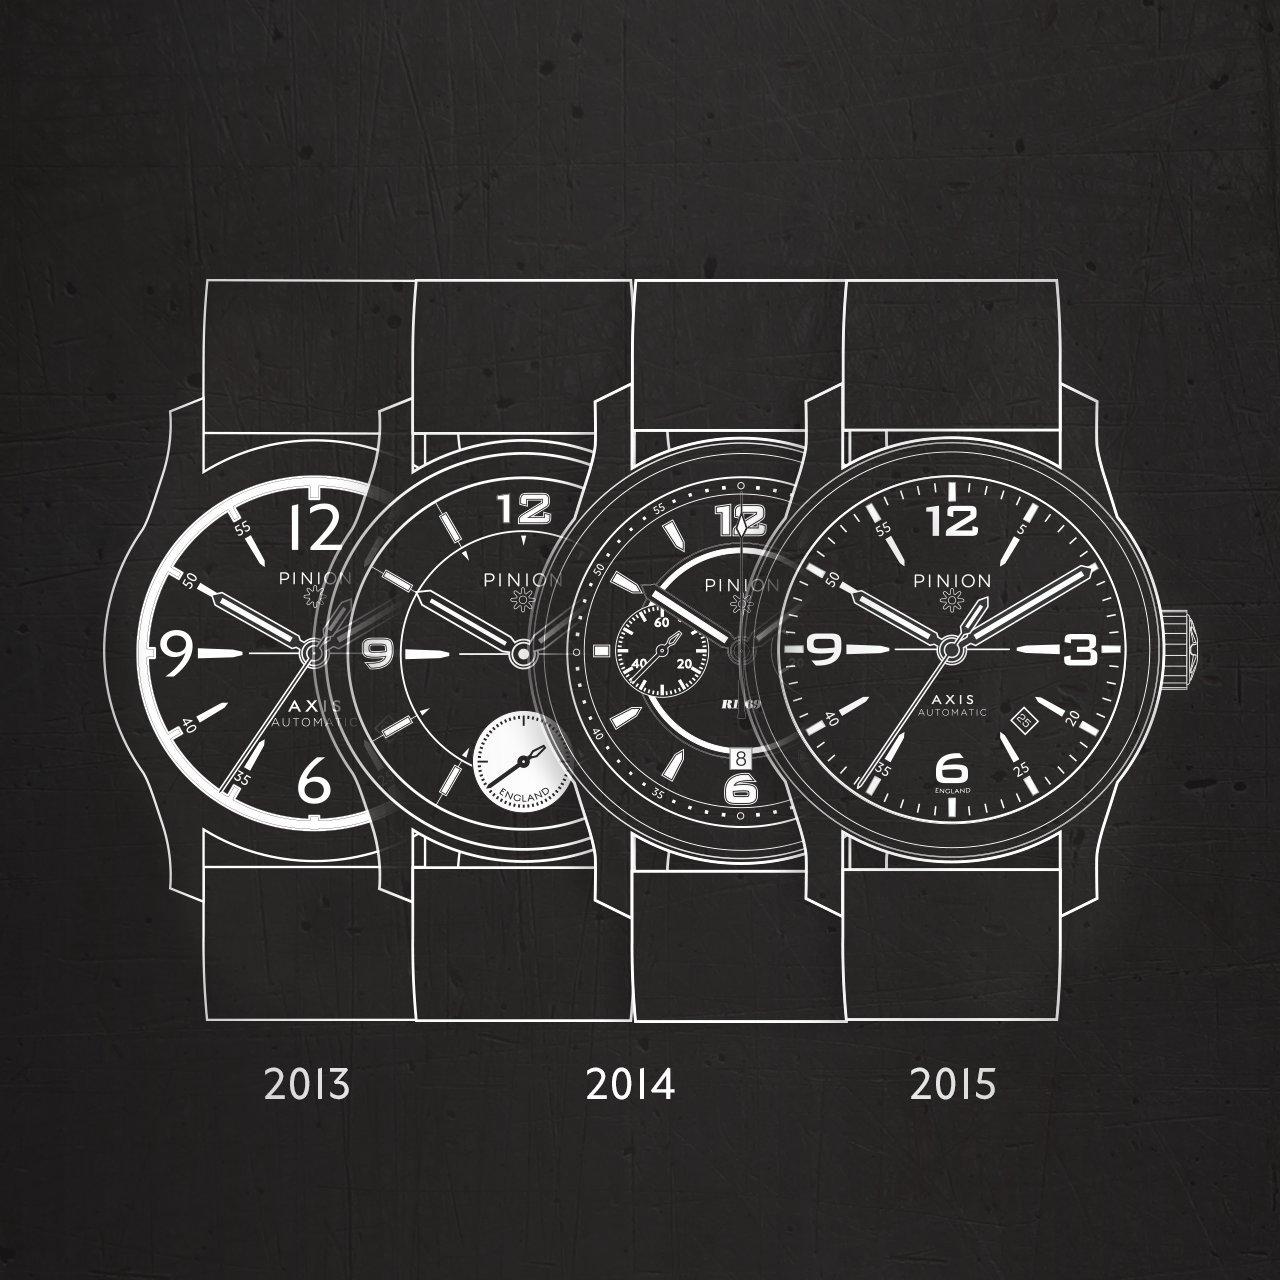 Pinion watch design continuity